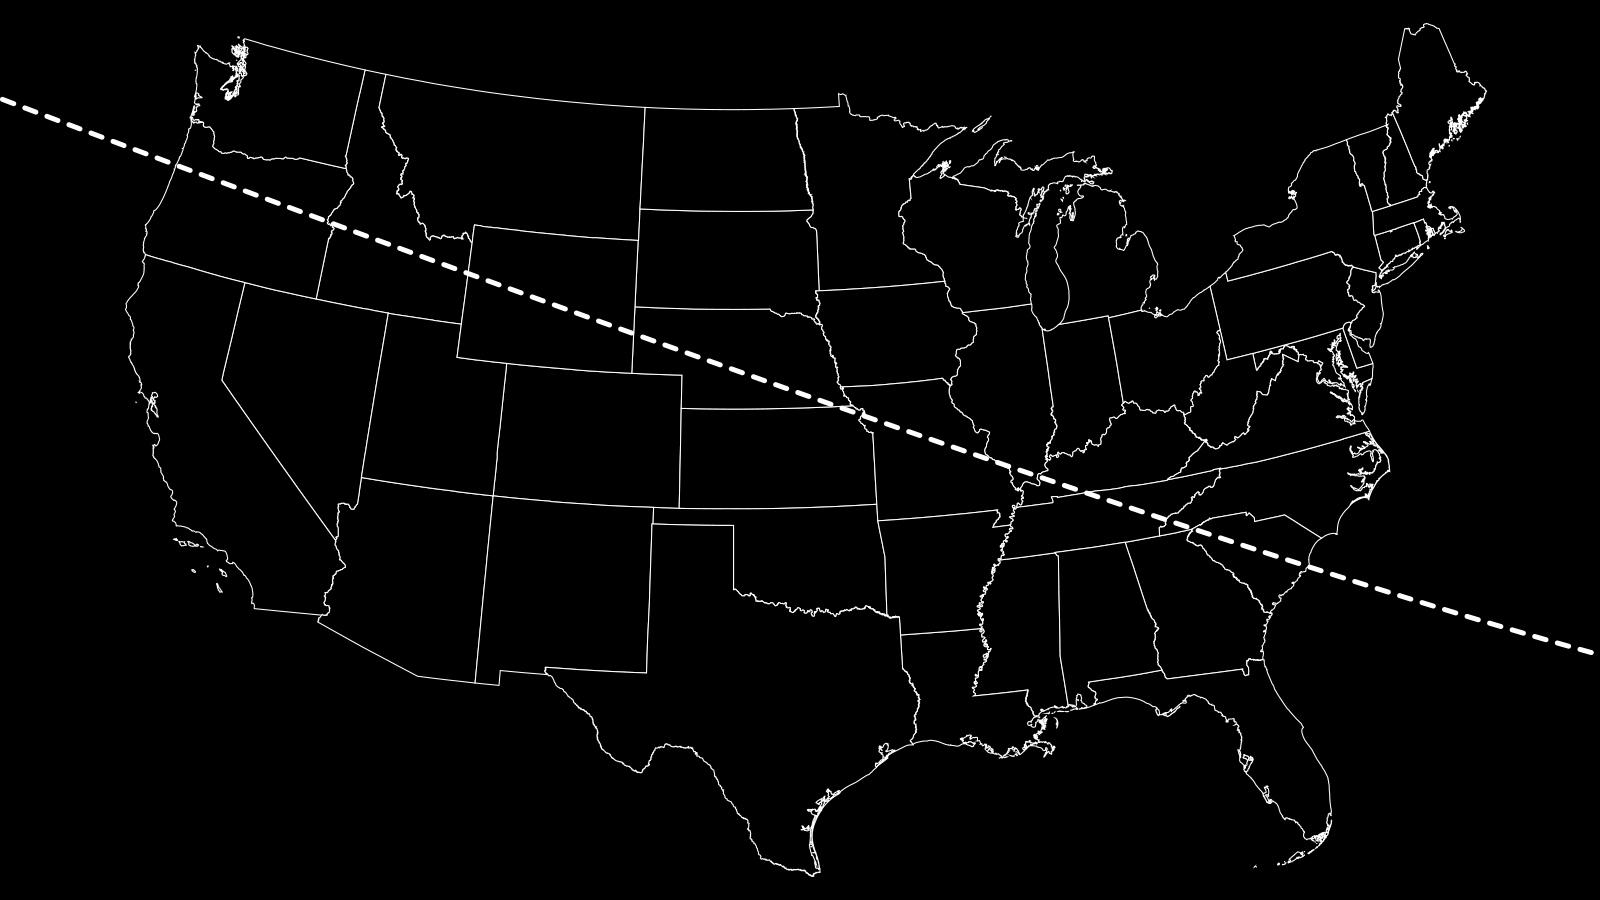 Path of the solar eclipse   CNN.com